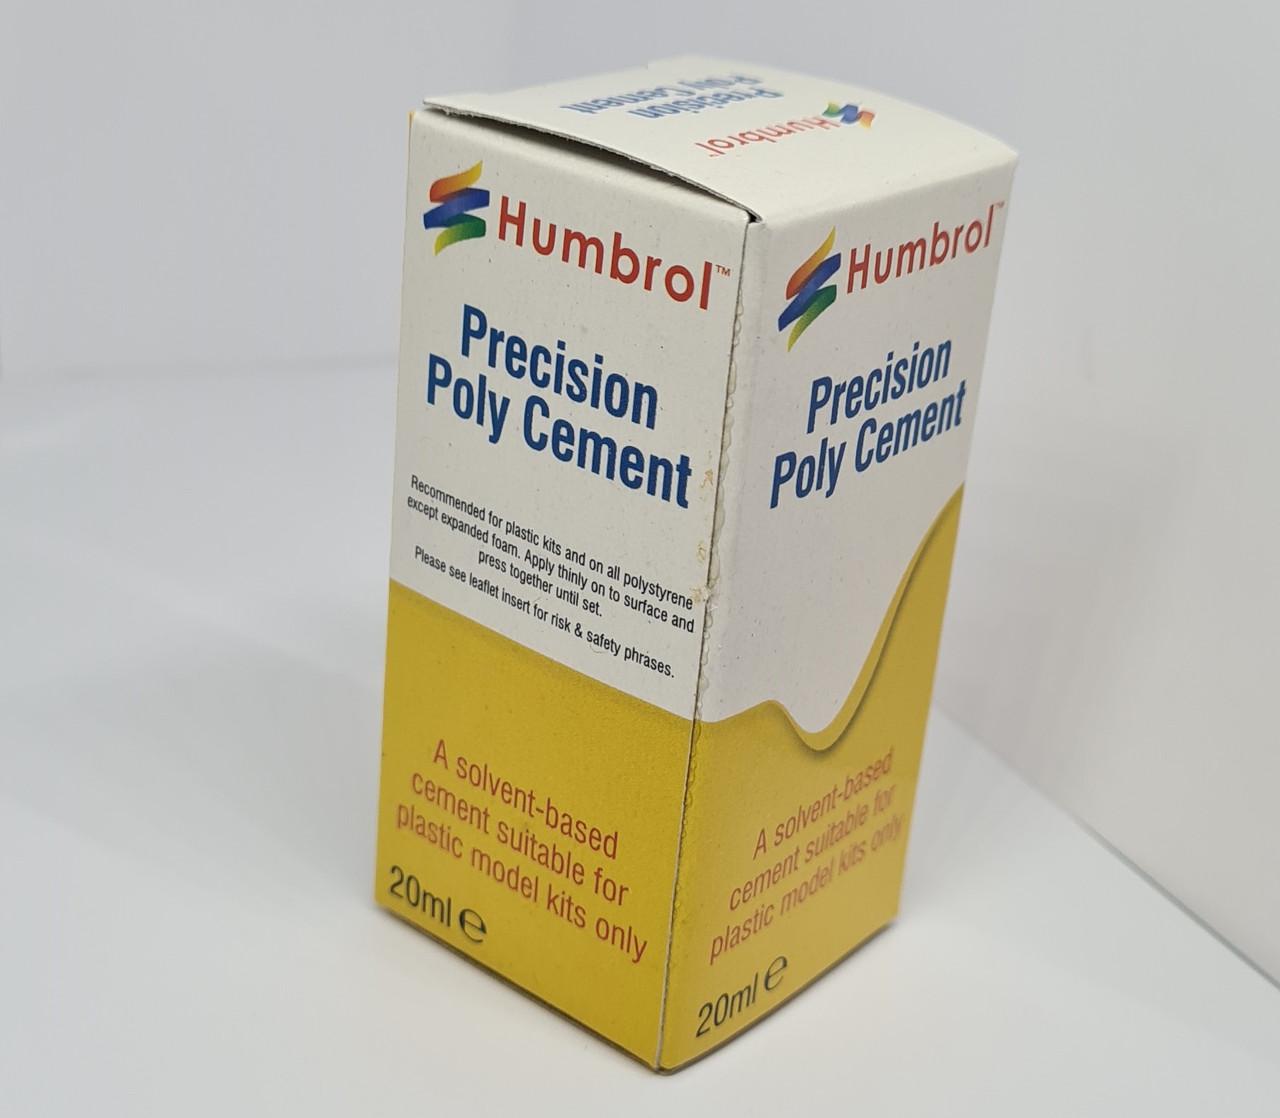 Humbrol Precision Poly Cement/ Glue AE2720